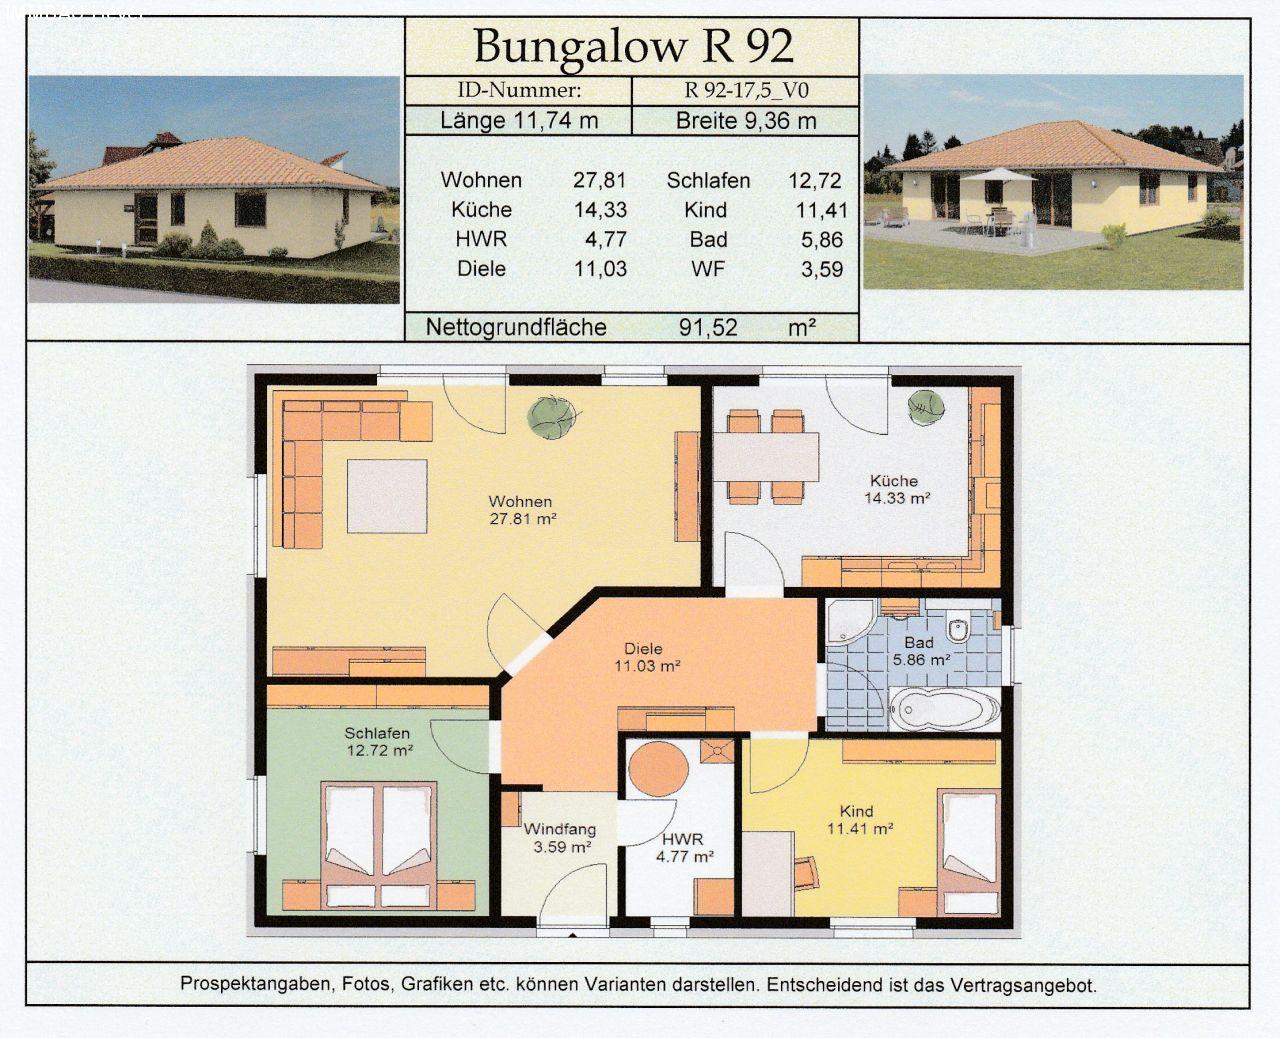 preiswert bauen 24 programm ludwigsfelde bungalow r 92. Black Bedroom Furniture Sets. Home Design Ideas